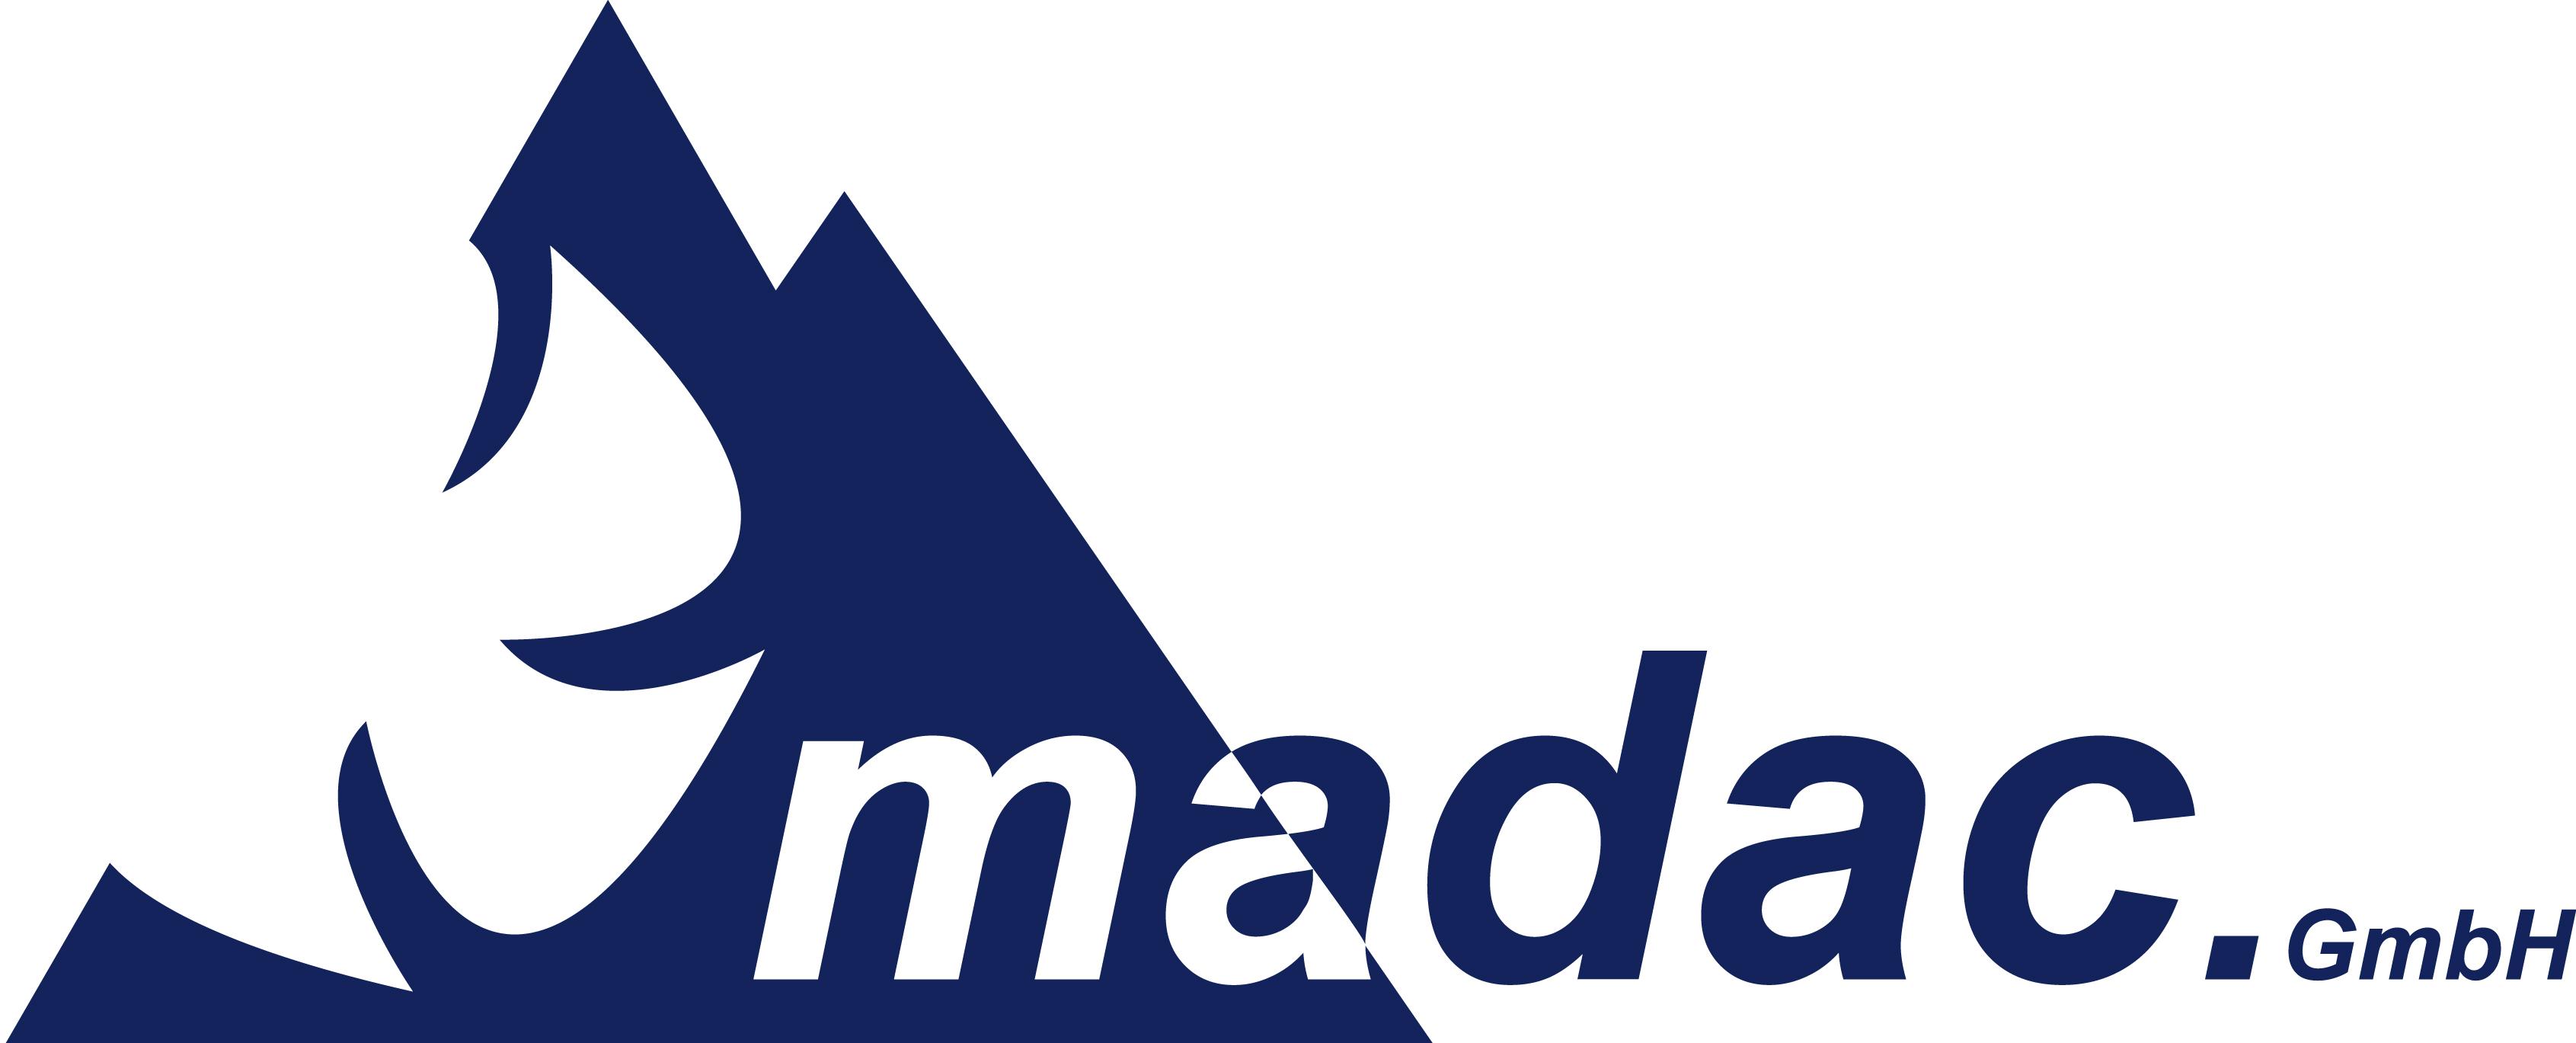 madac. GmbH